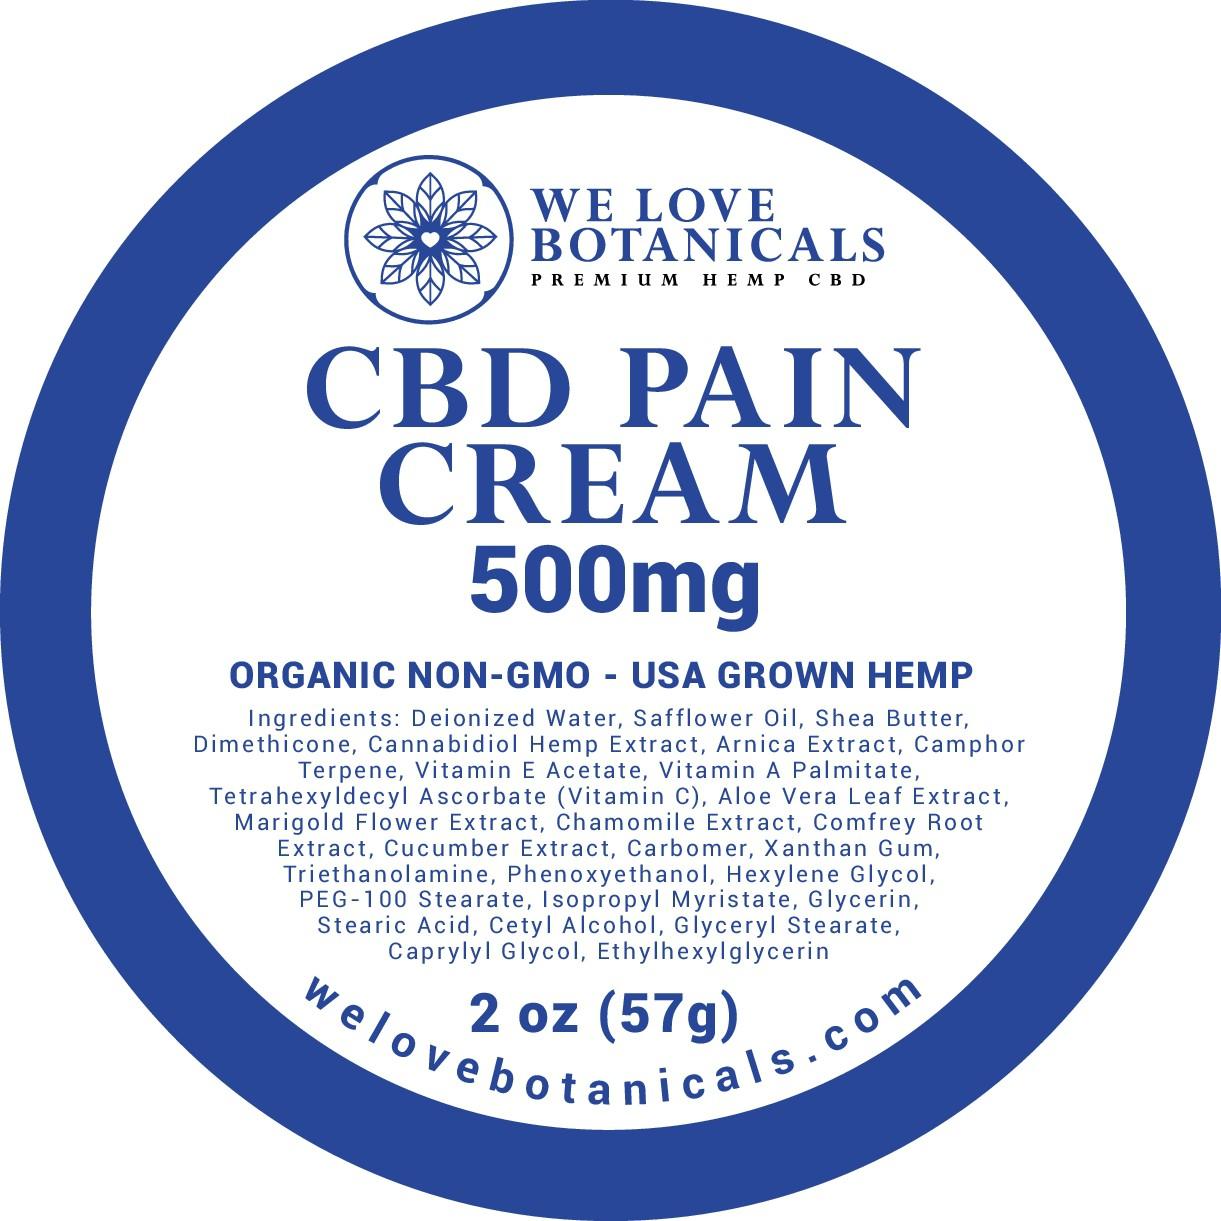 5 Product Labels based on We Love Botanicals logo